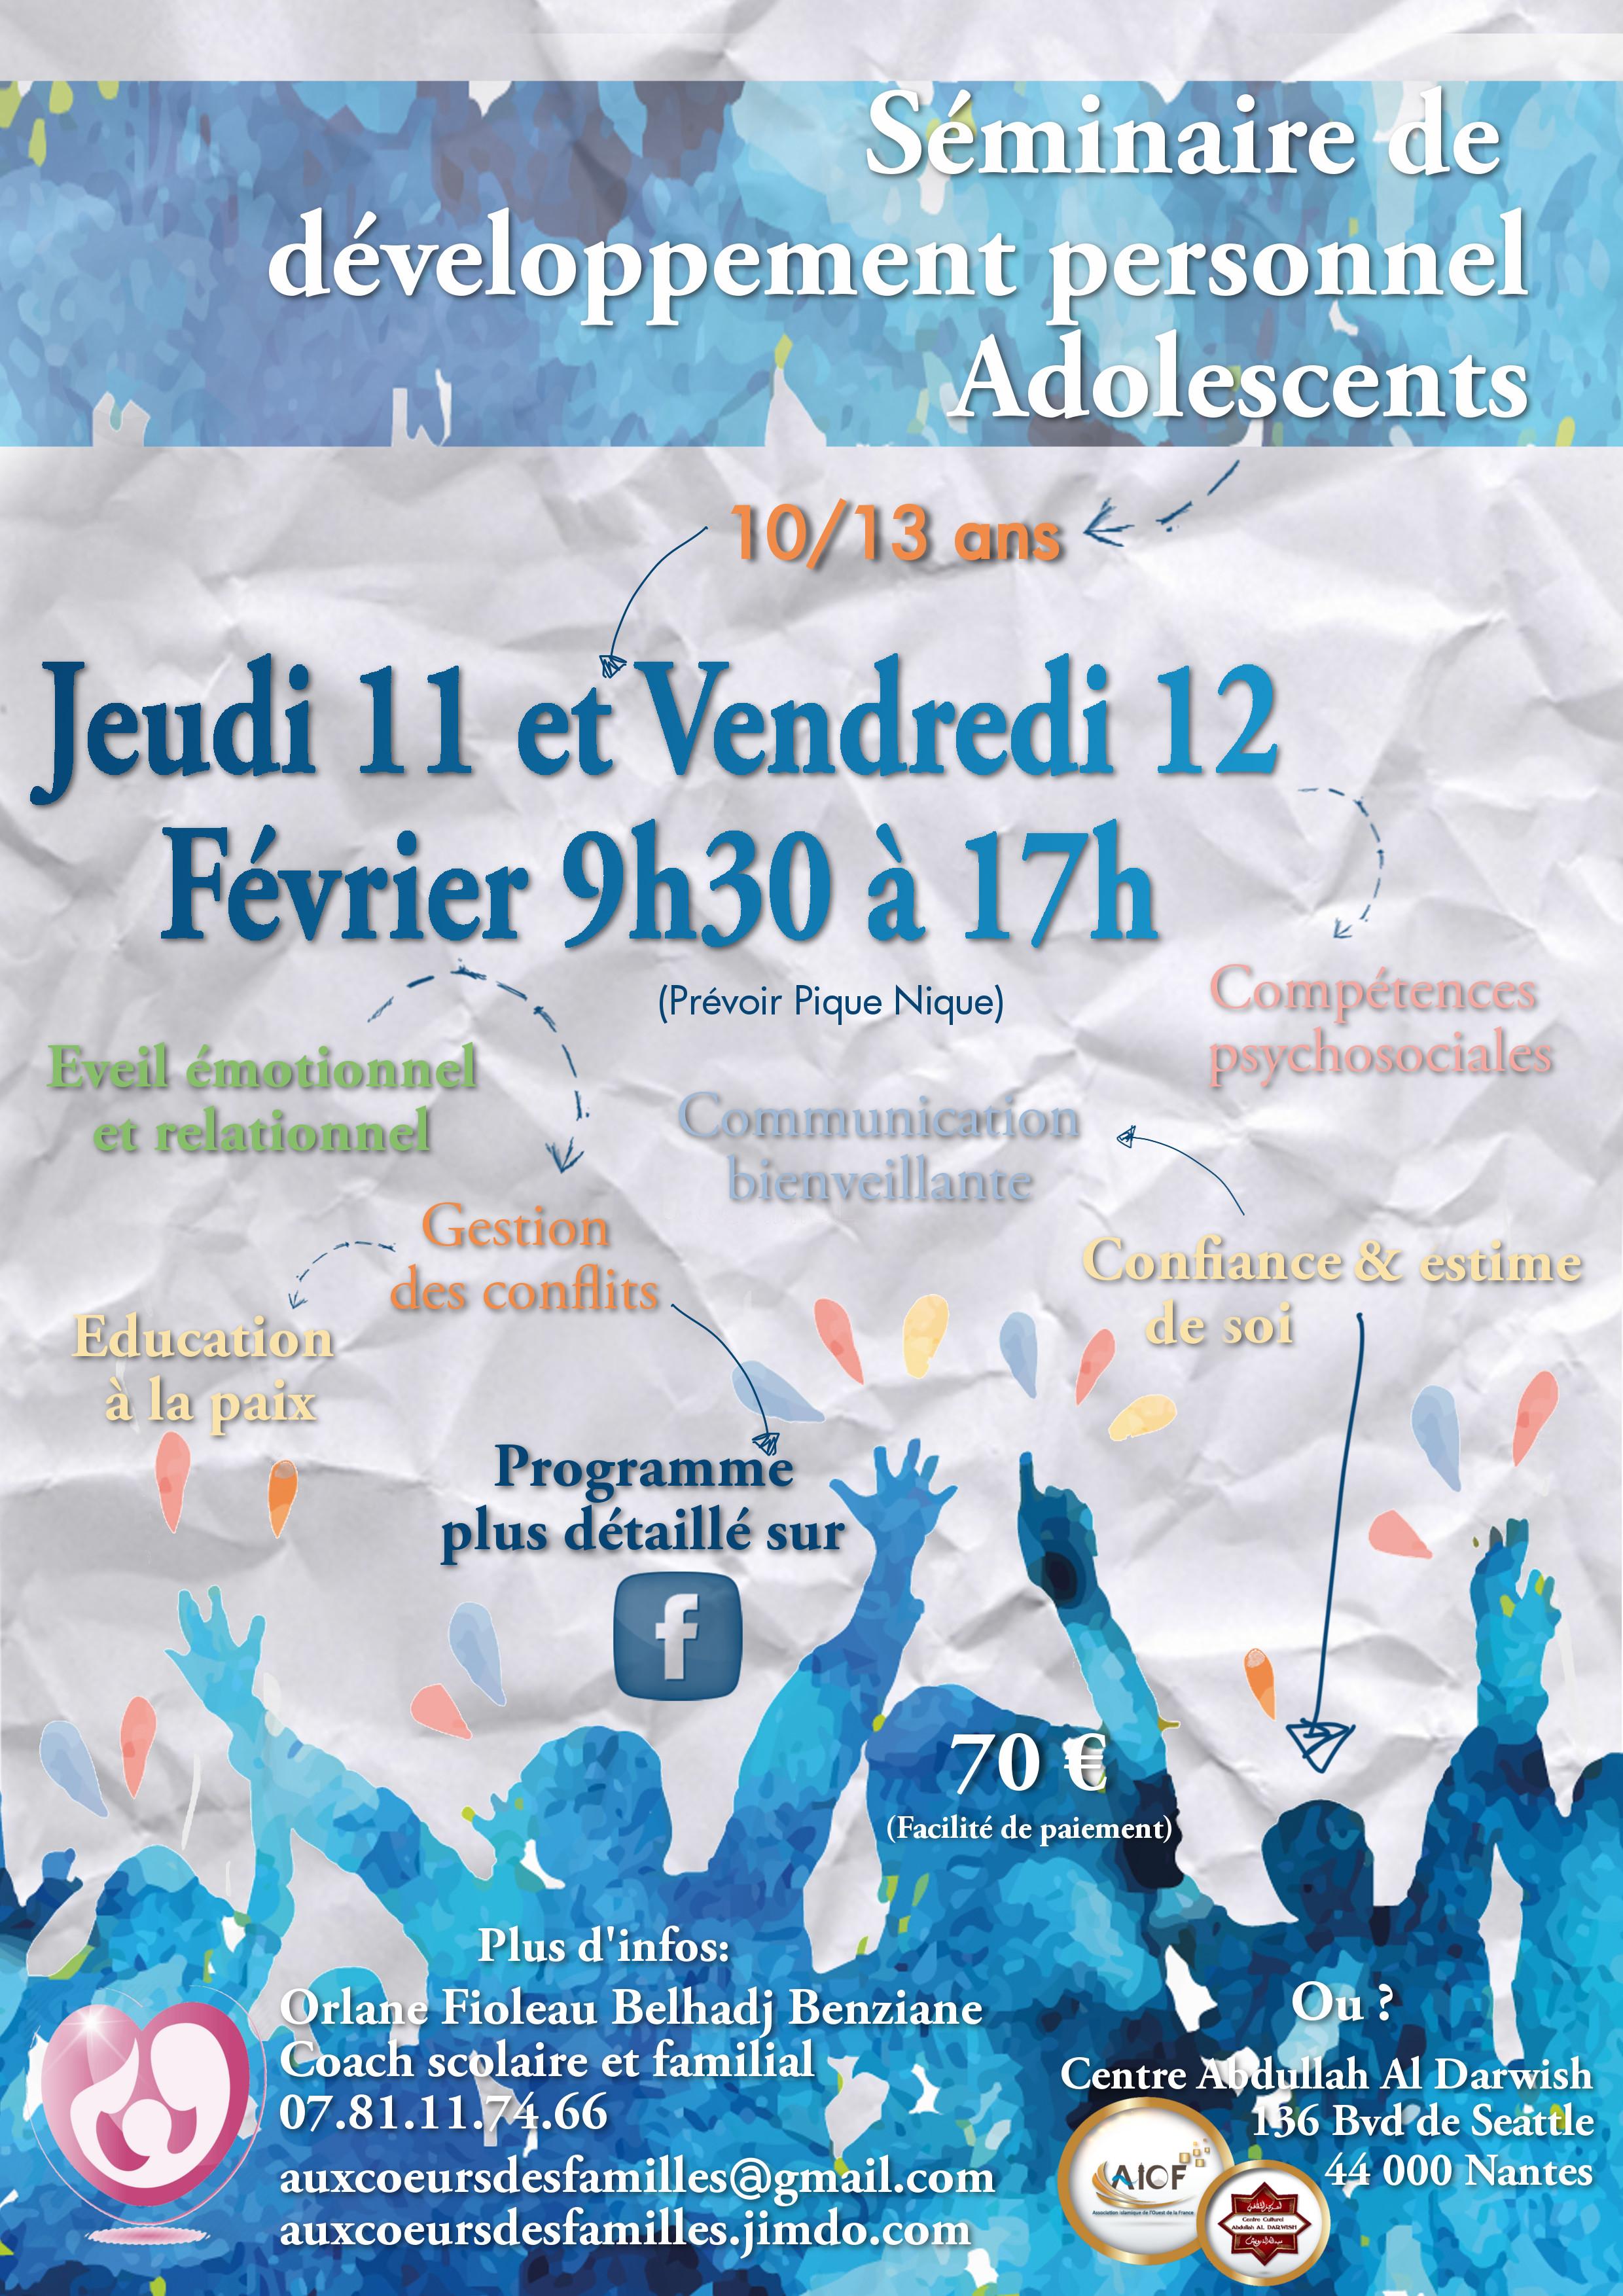 Rencontre Adolescent 15 Ans